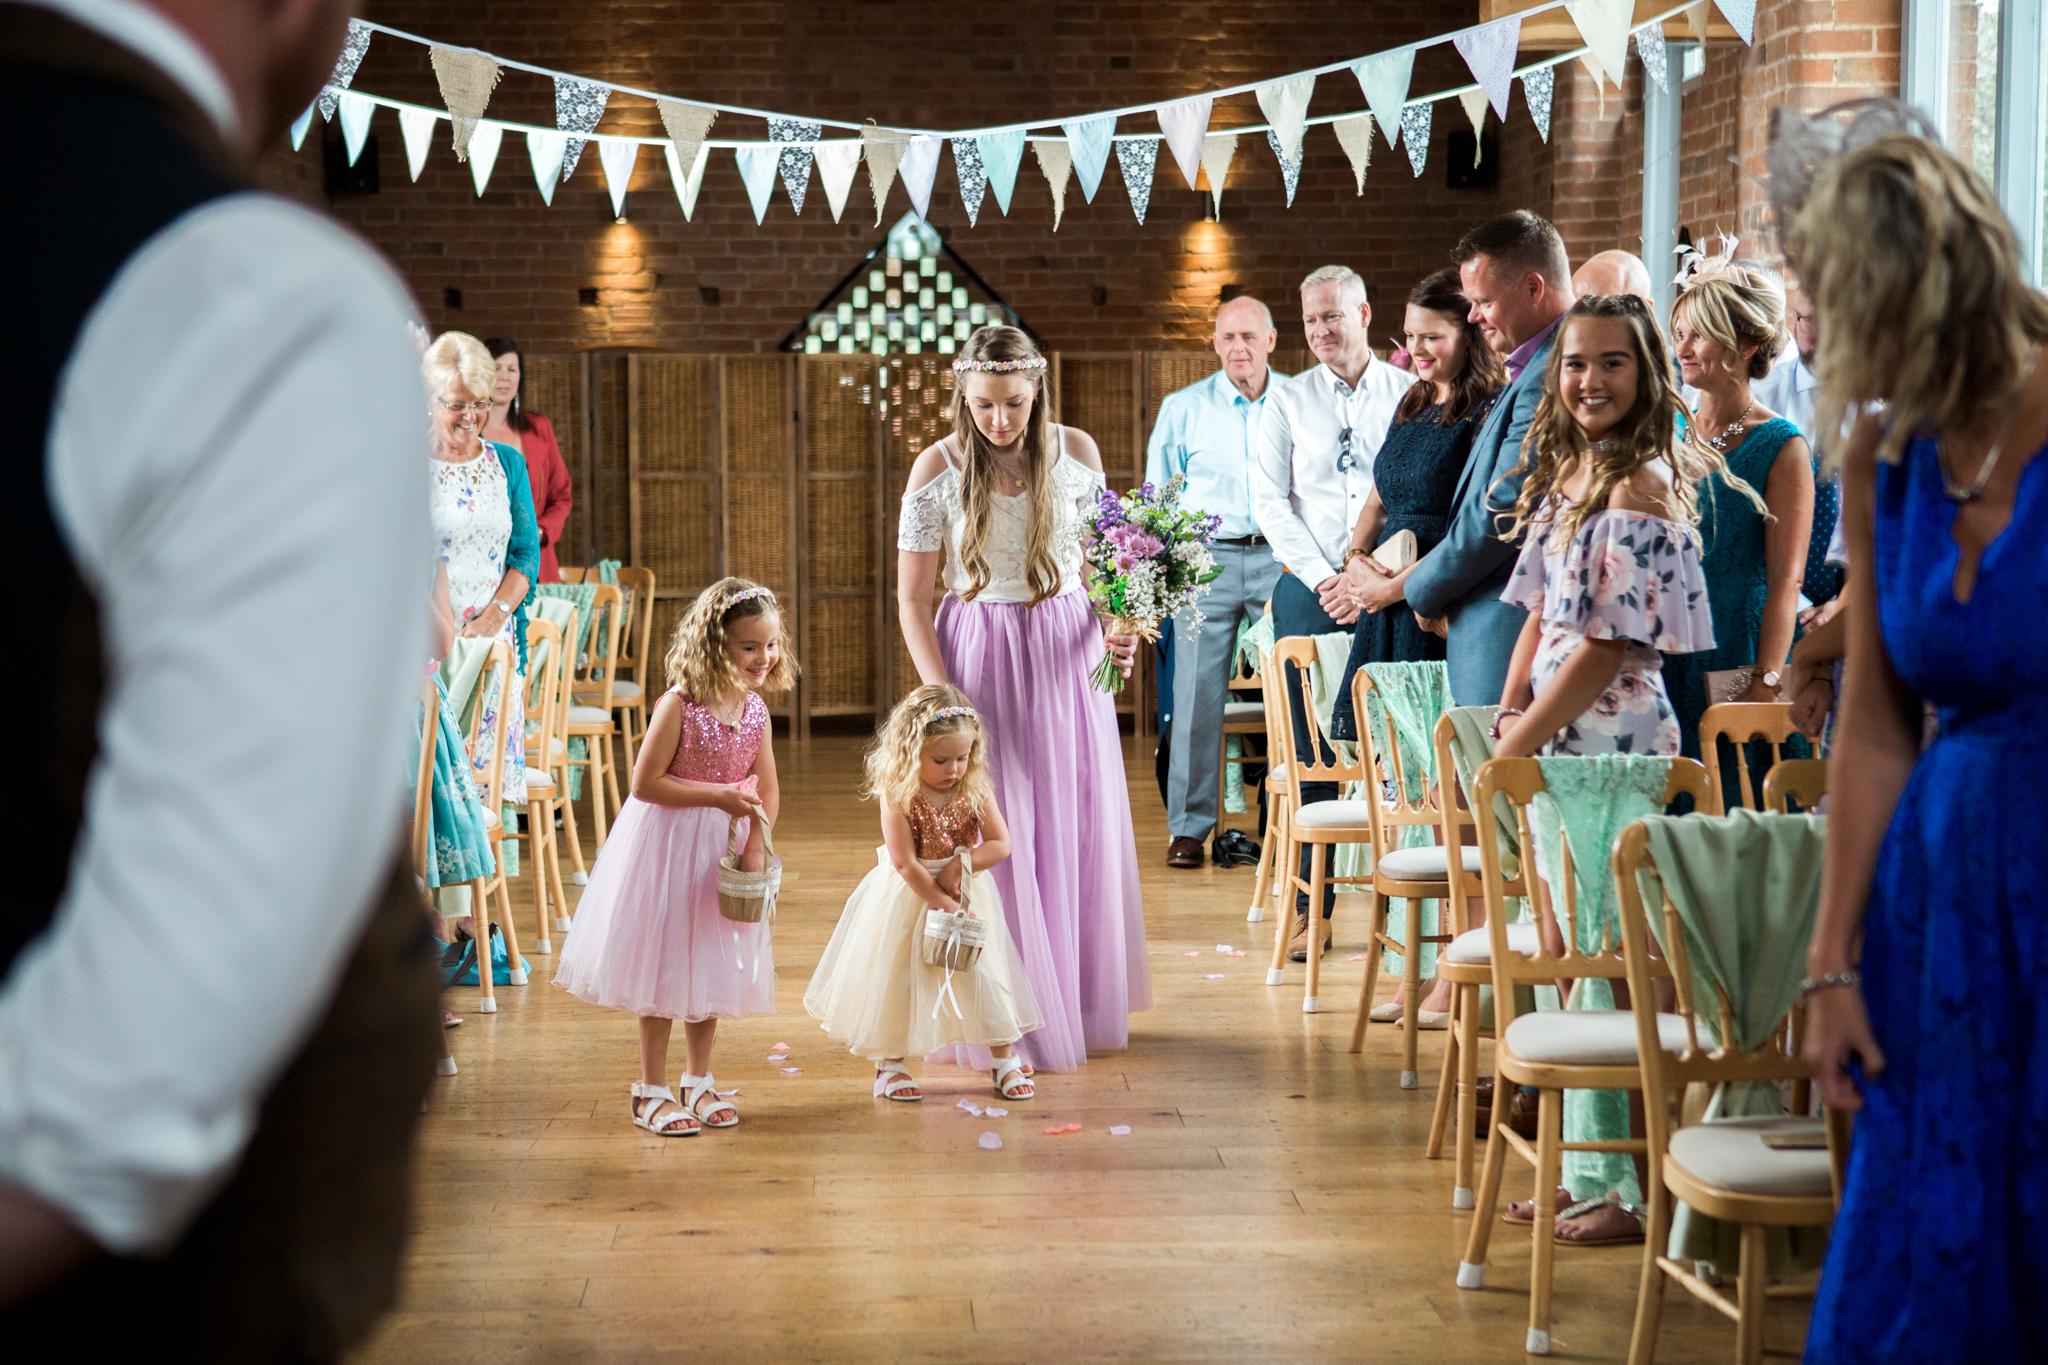 Rowsie & Lee, Swallows Nest Barn Wedding, Cotswold wedding photographer, Warwickshire Wedding Photographer-41.jpg